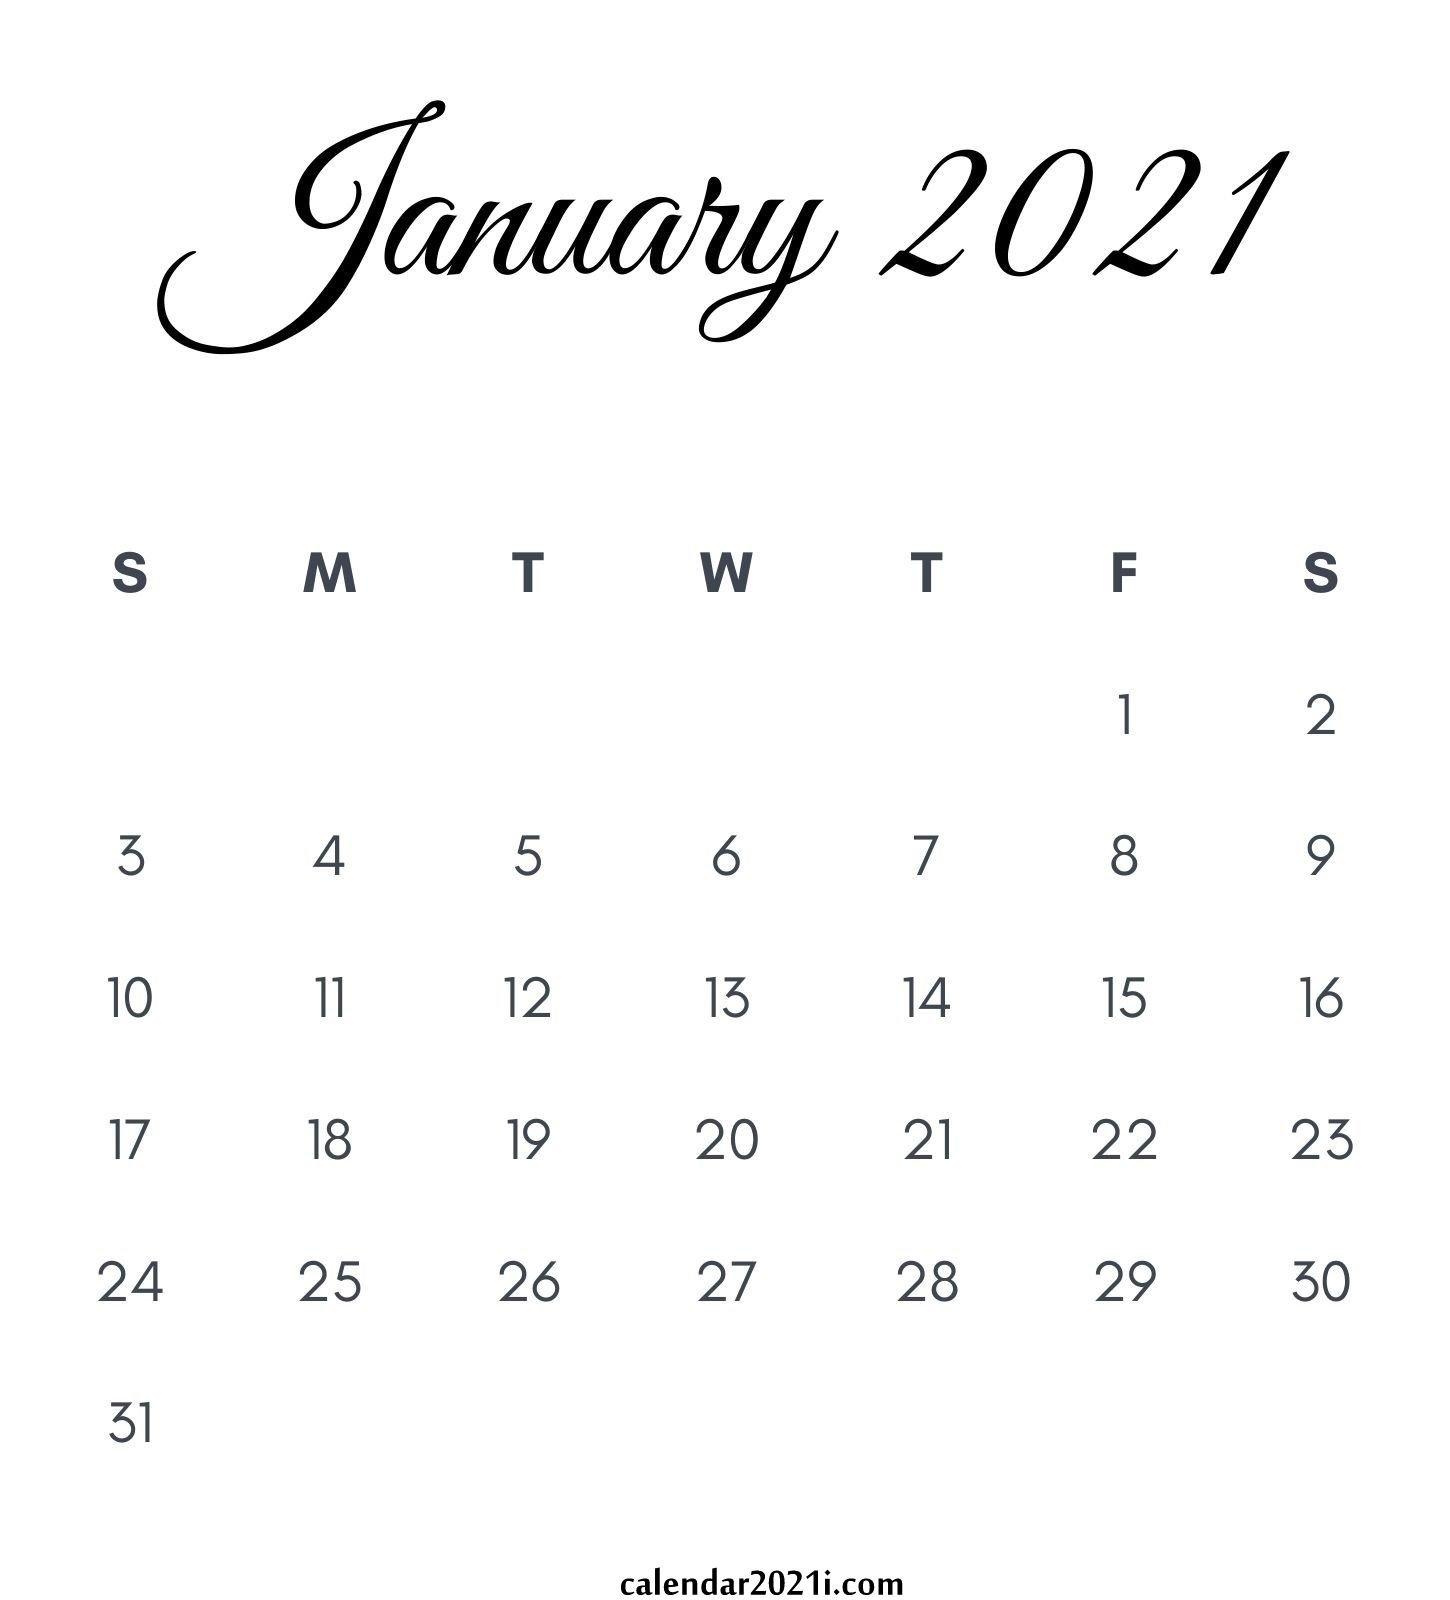 2021 Calendar Monthly Printable   Calendar 2021 within Print Calendar 2021 Monthly Free Photo